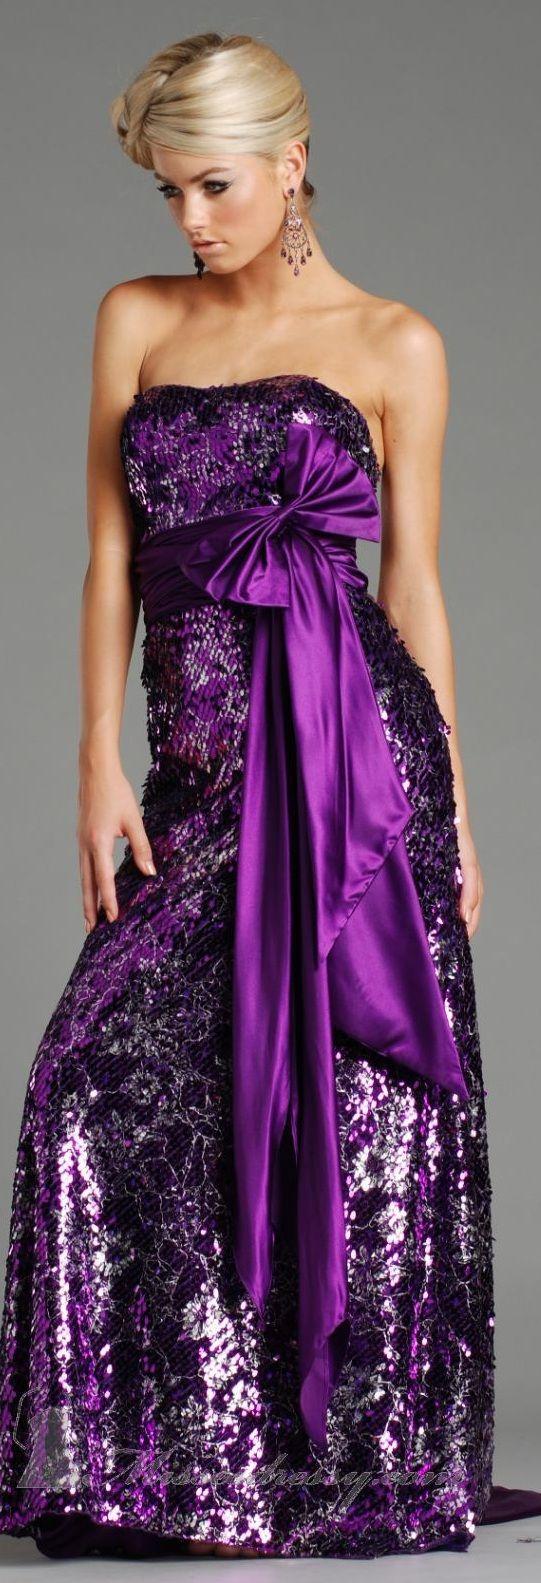 Jolene high couture ~ | pasiune pentru mov | Pinterest | Lilas ...